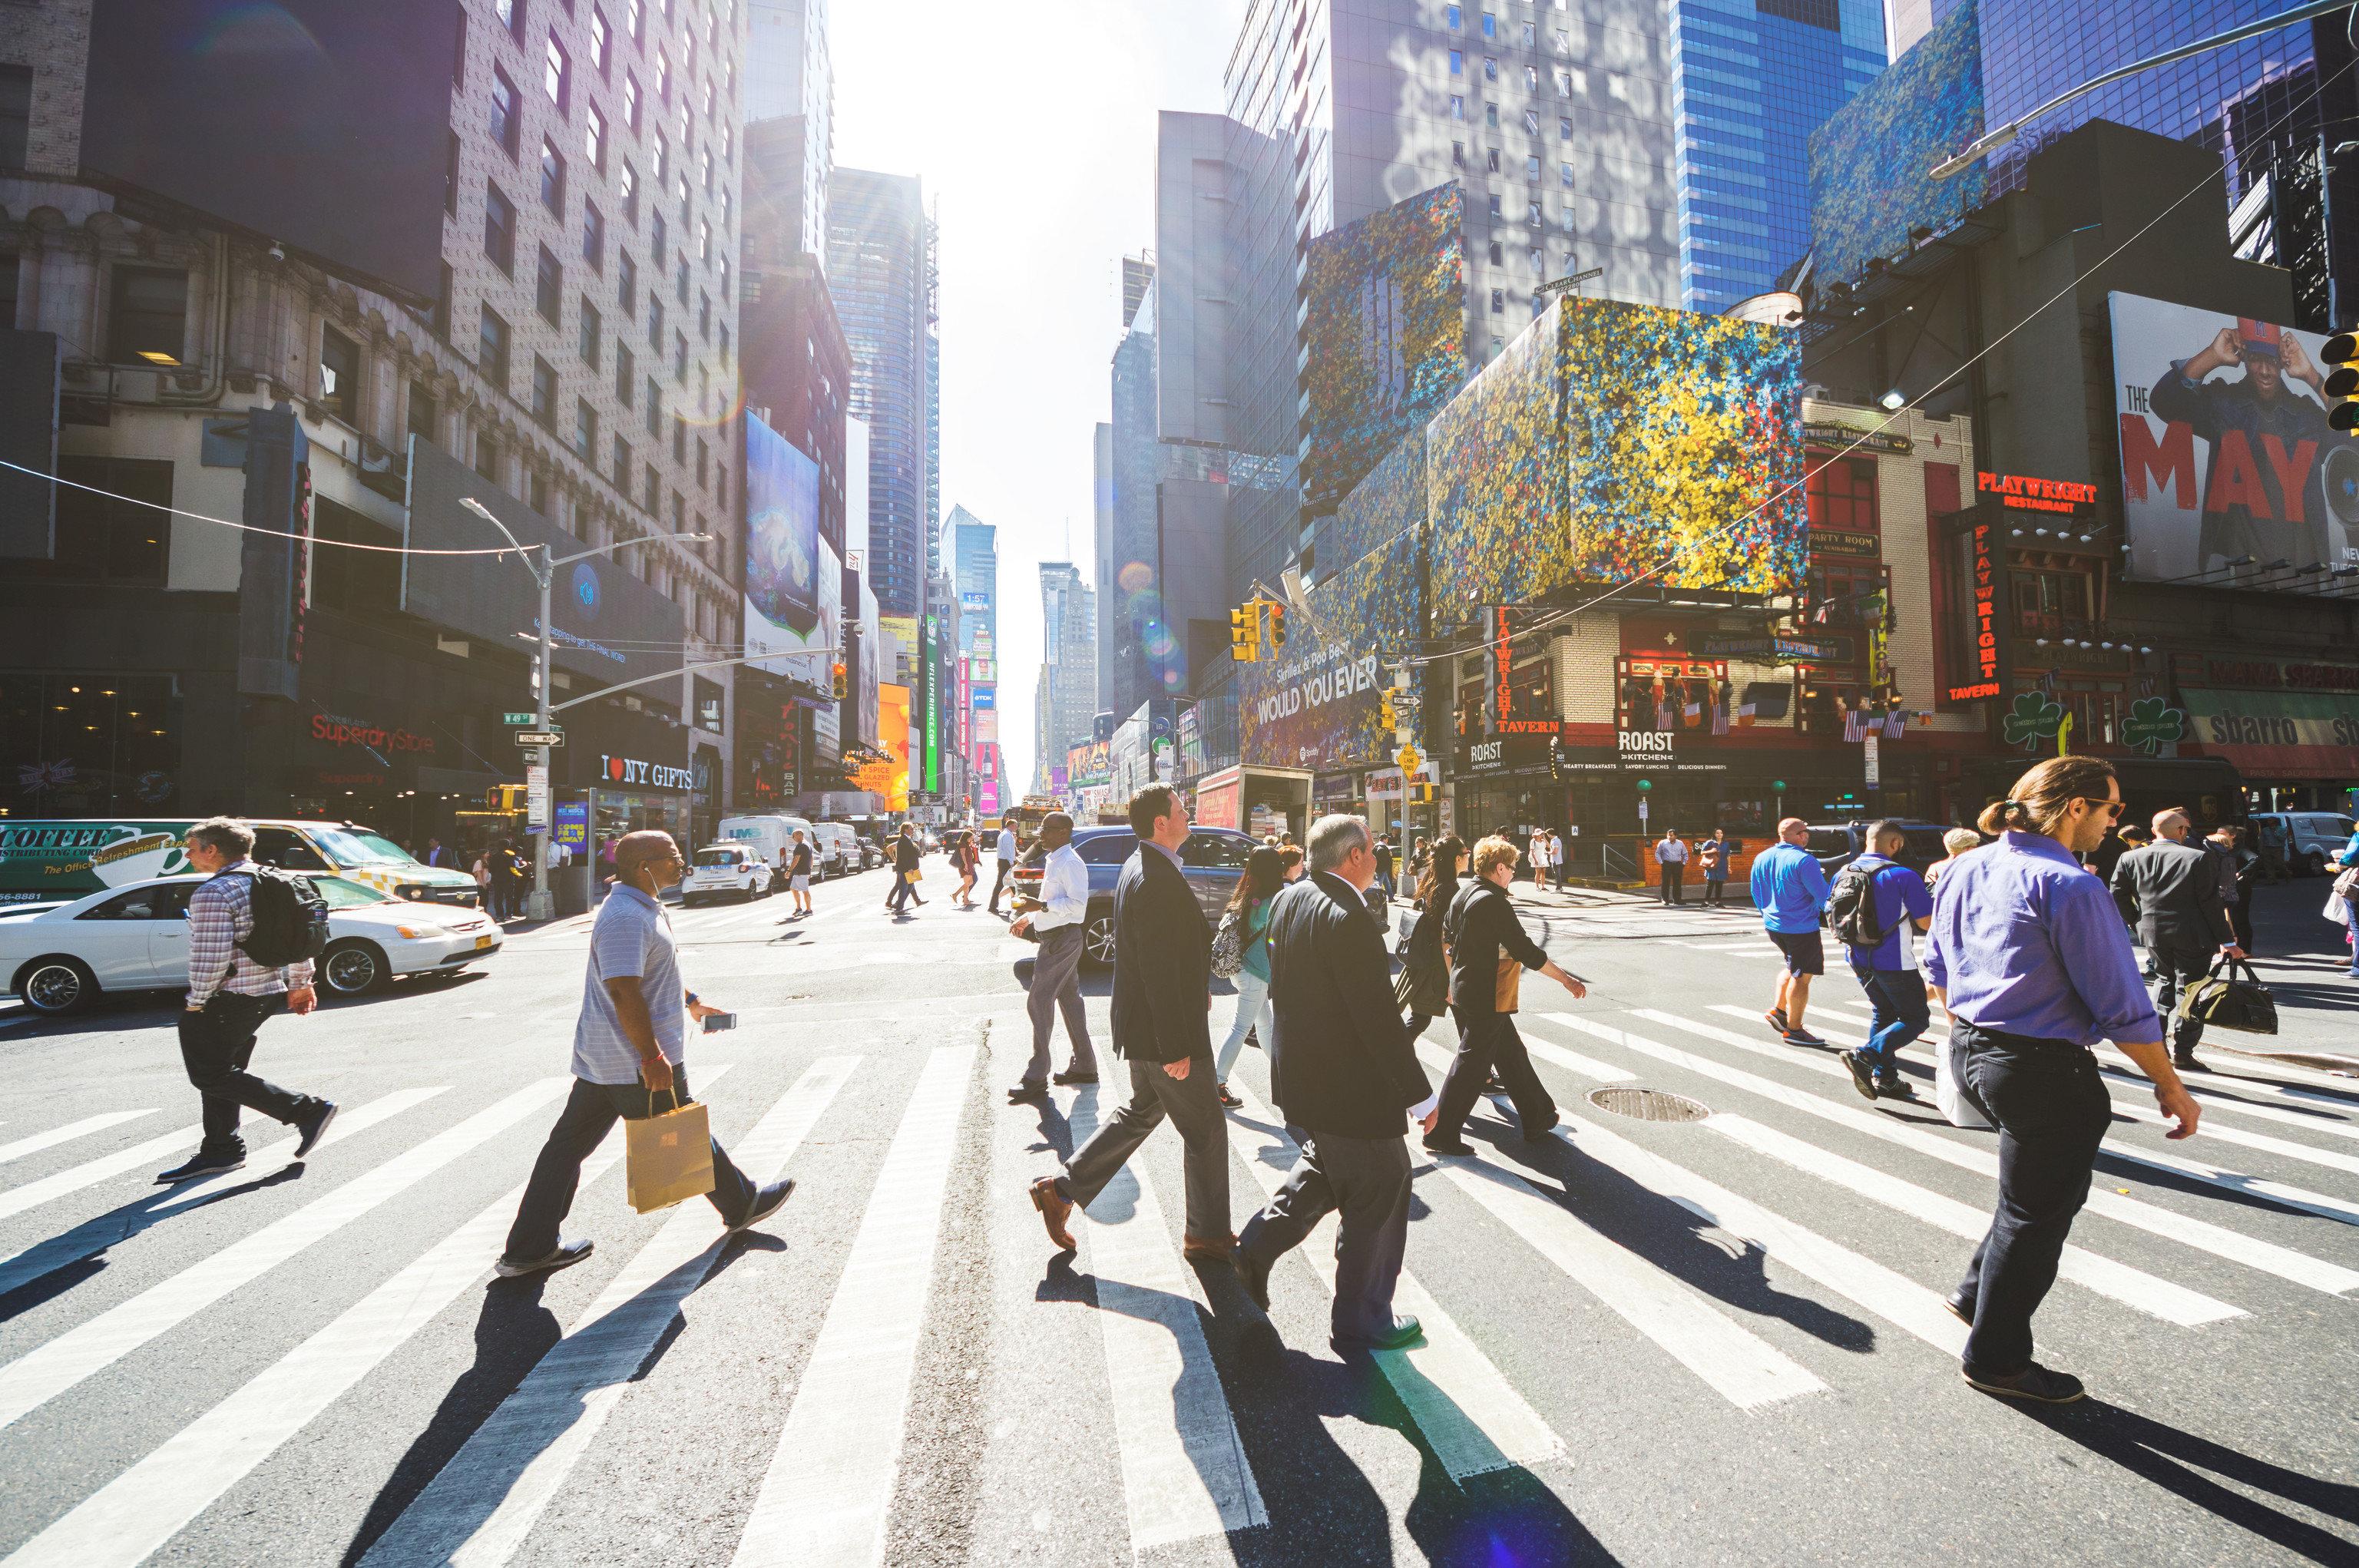 Style + Design Travel Tips urban area pedestrian metropolitan area City infrastructure Downtown pedestrian crossing street daytime metropolis crowd road recreation Winter lane zebra crossing walking building